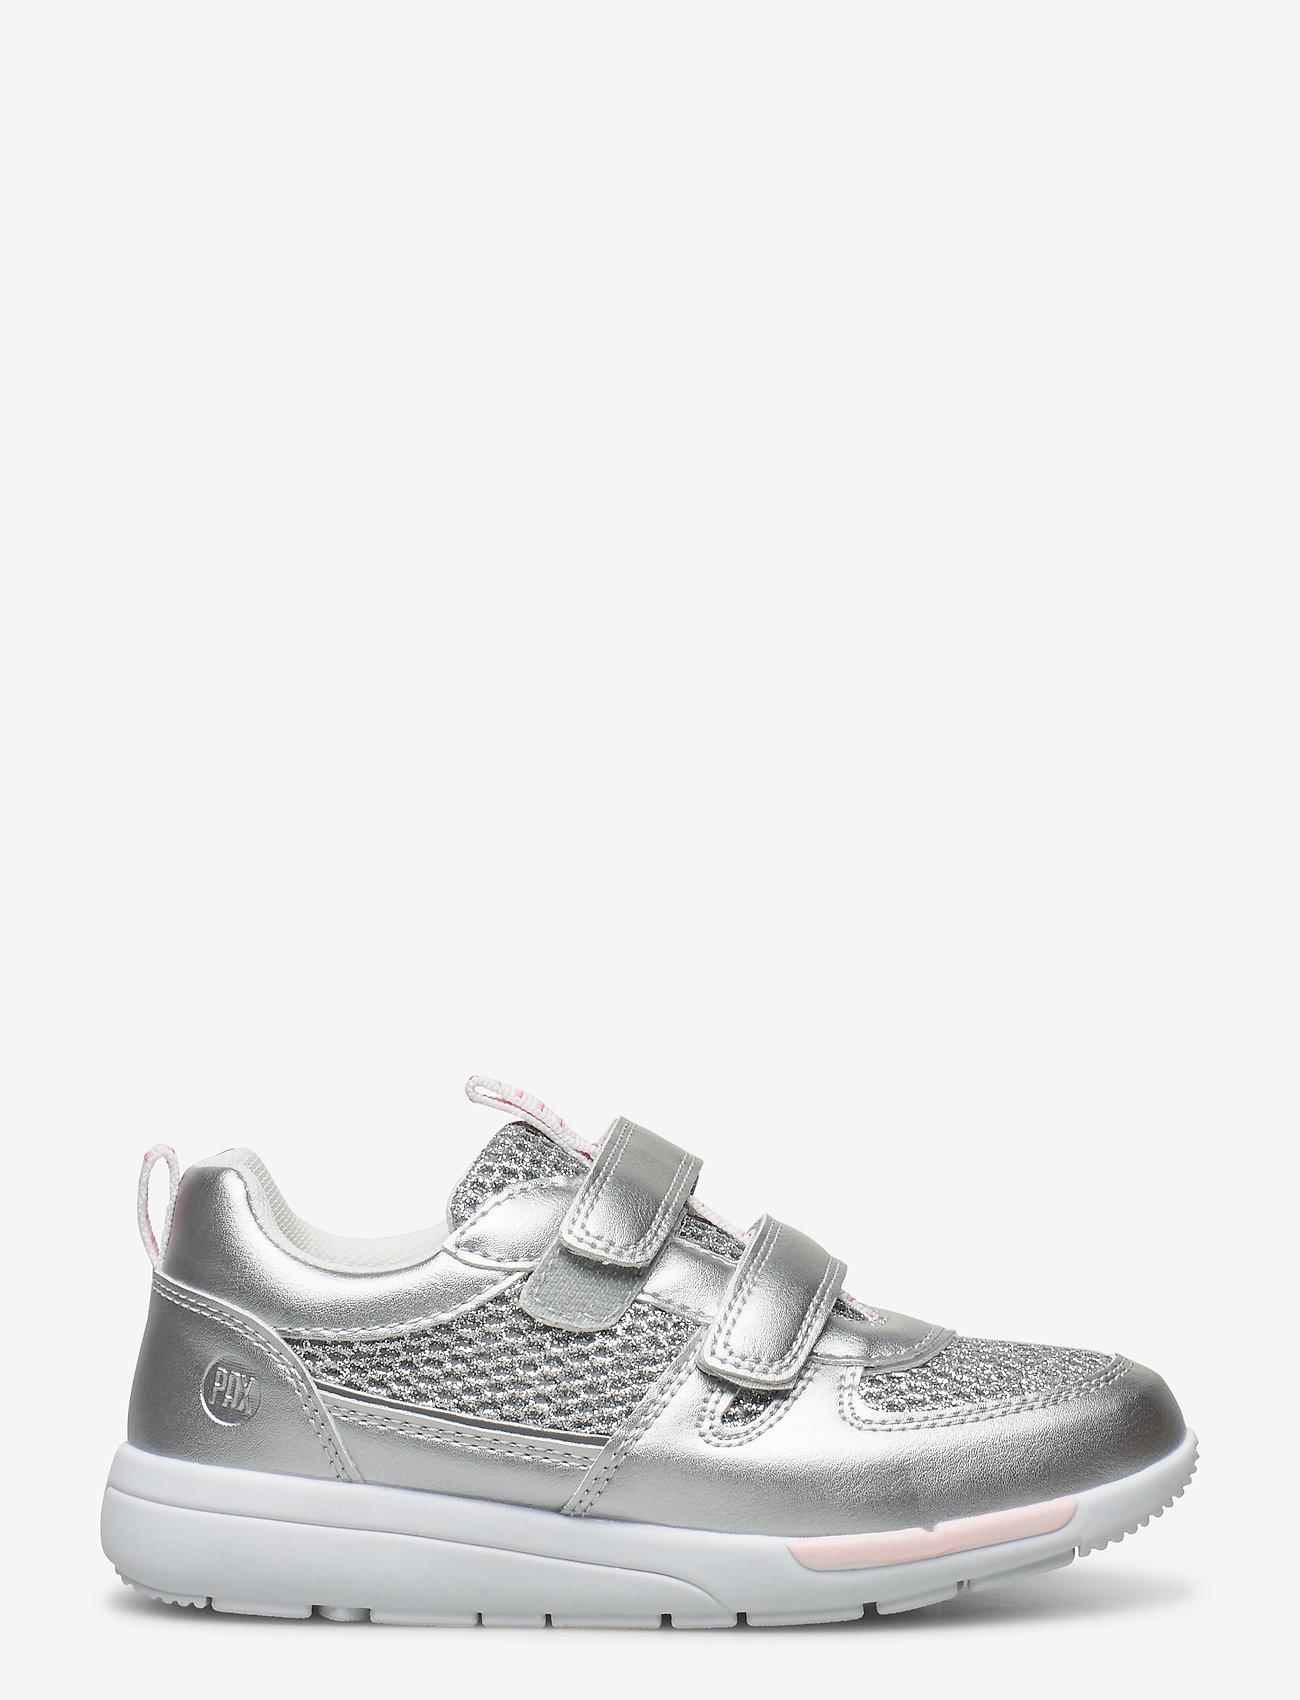 PAX - TERRY PAX SKO - baskets - silver